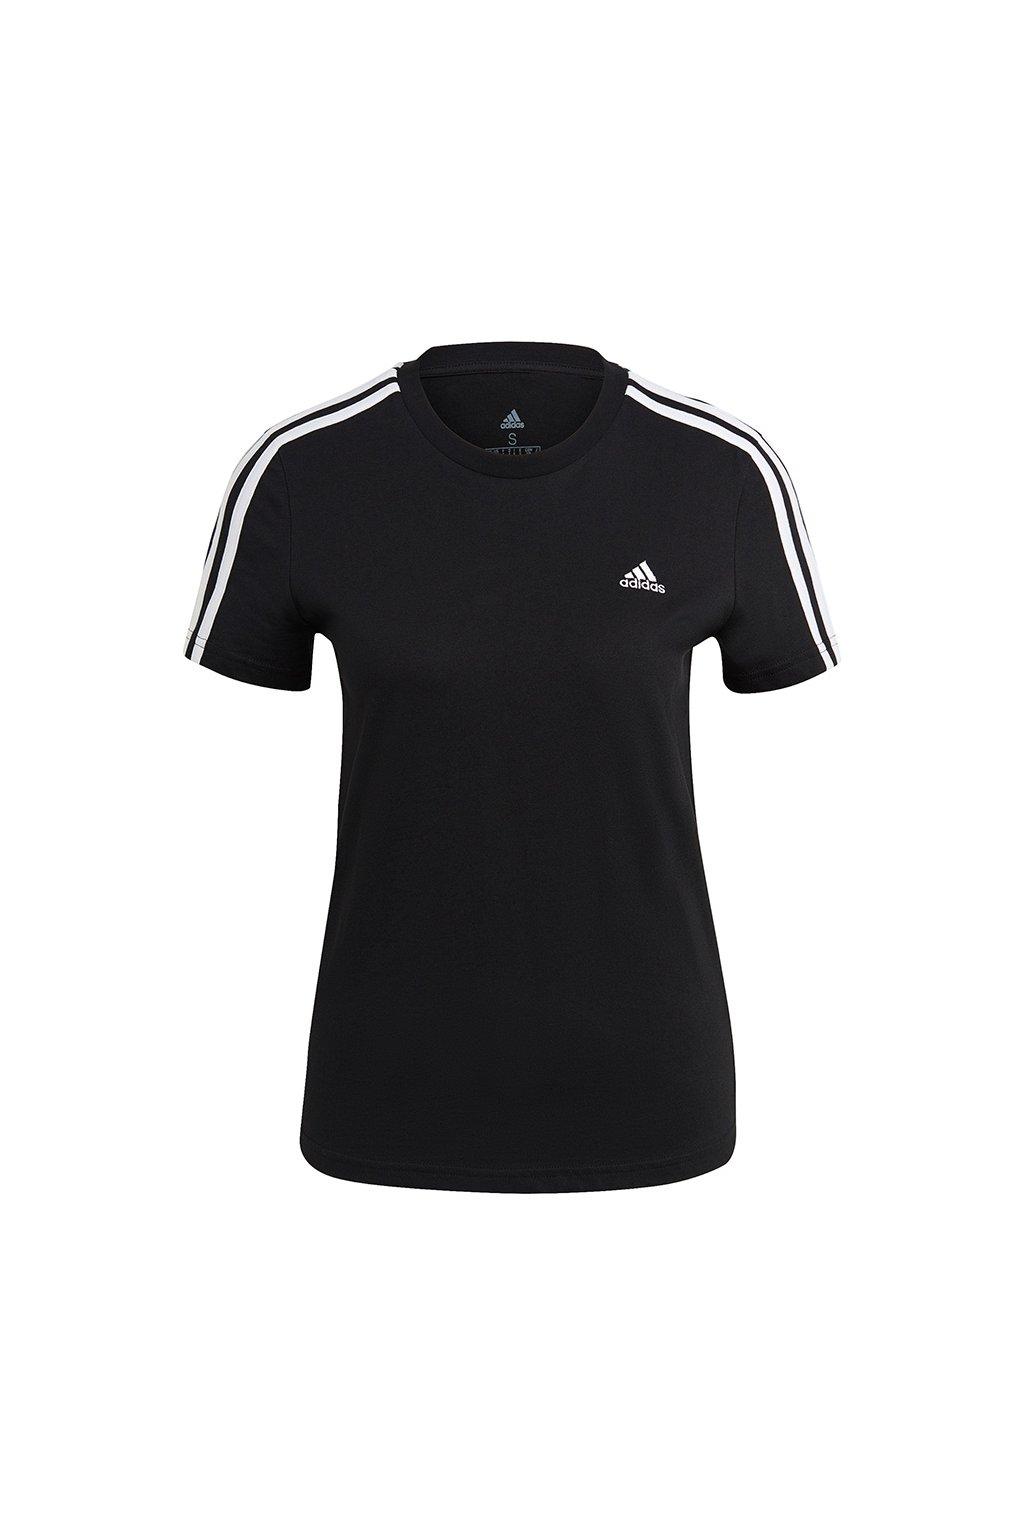 Dámske tričko adidas Essentials Slim T-Shirt čierne GL0784